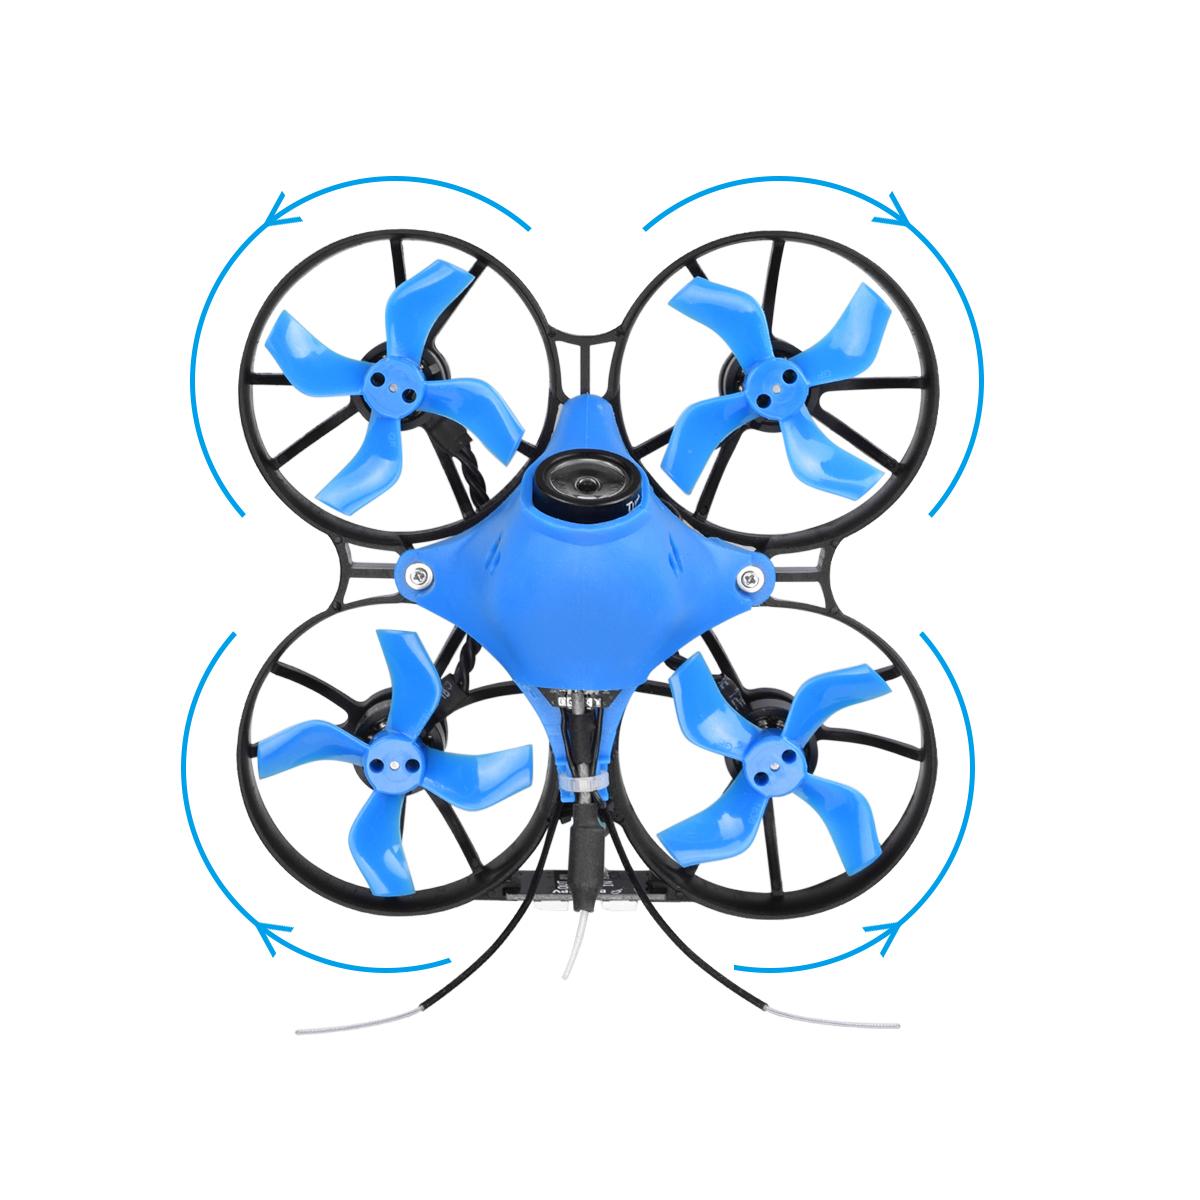 Quadcopter Motor Direction